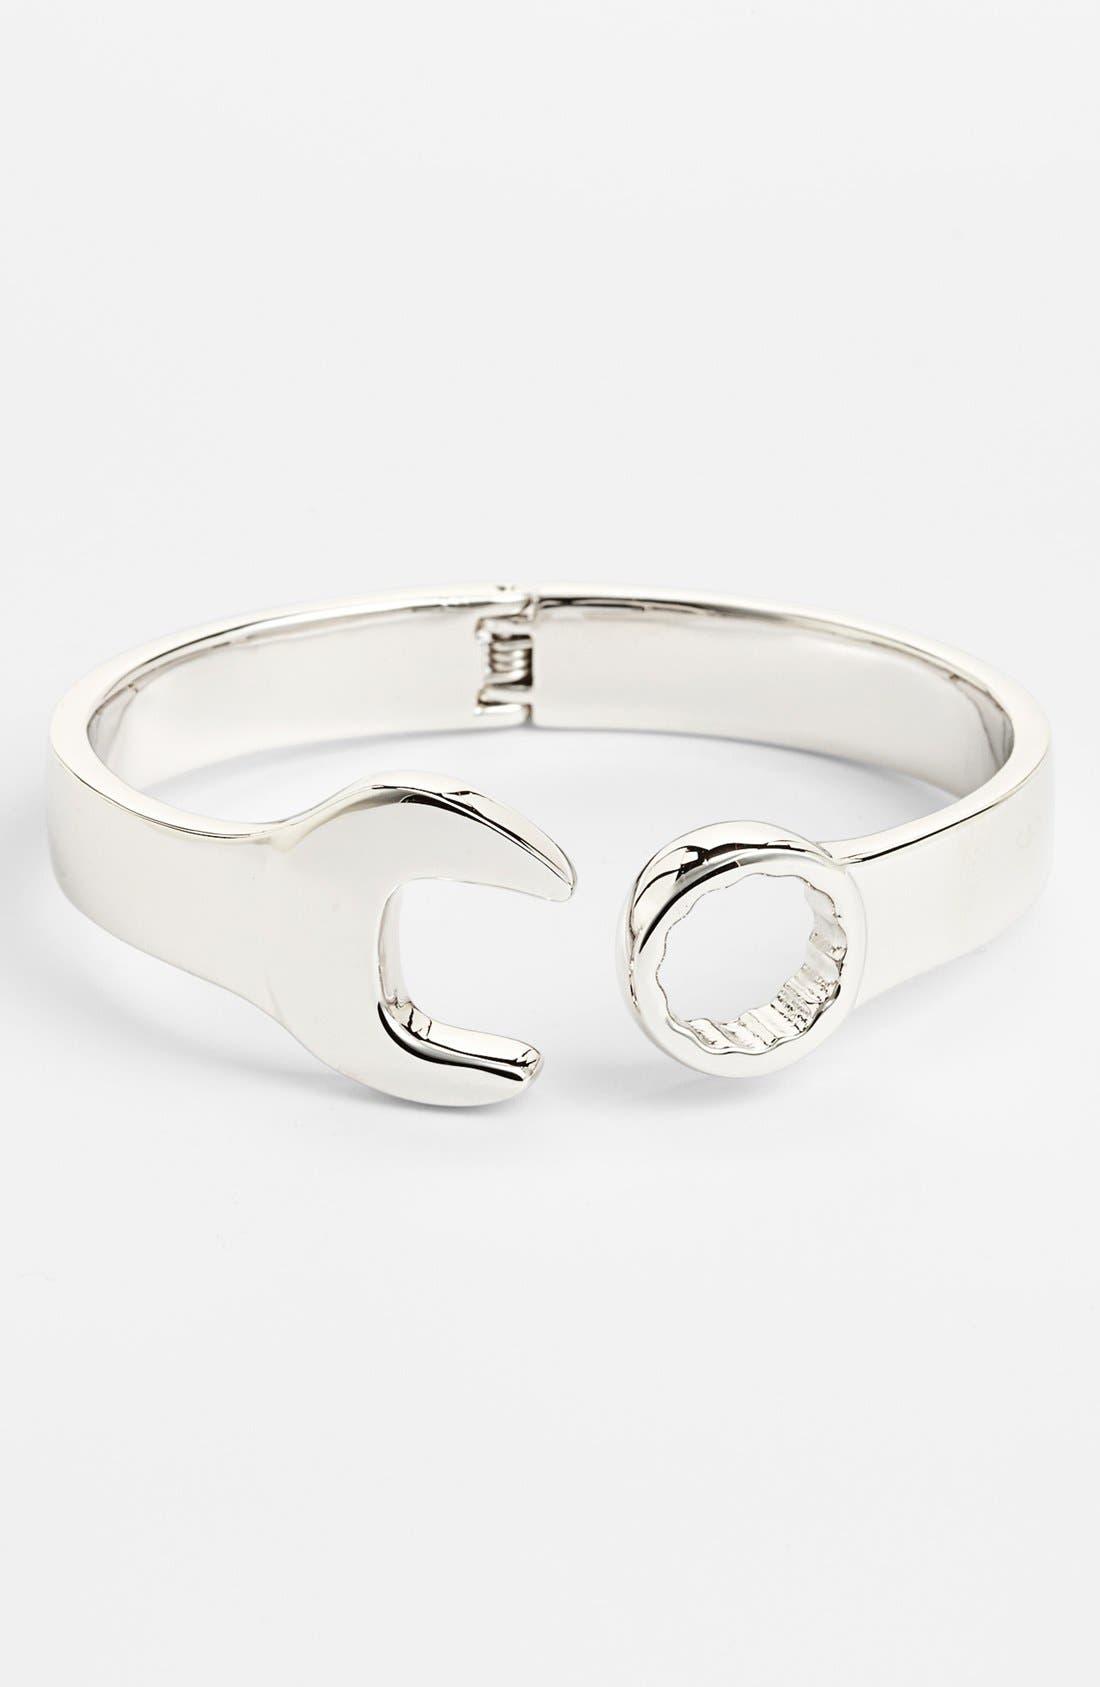 Alternate Image 1 Selected - Mateo Bijoux Hinged Wrench Bracelet